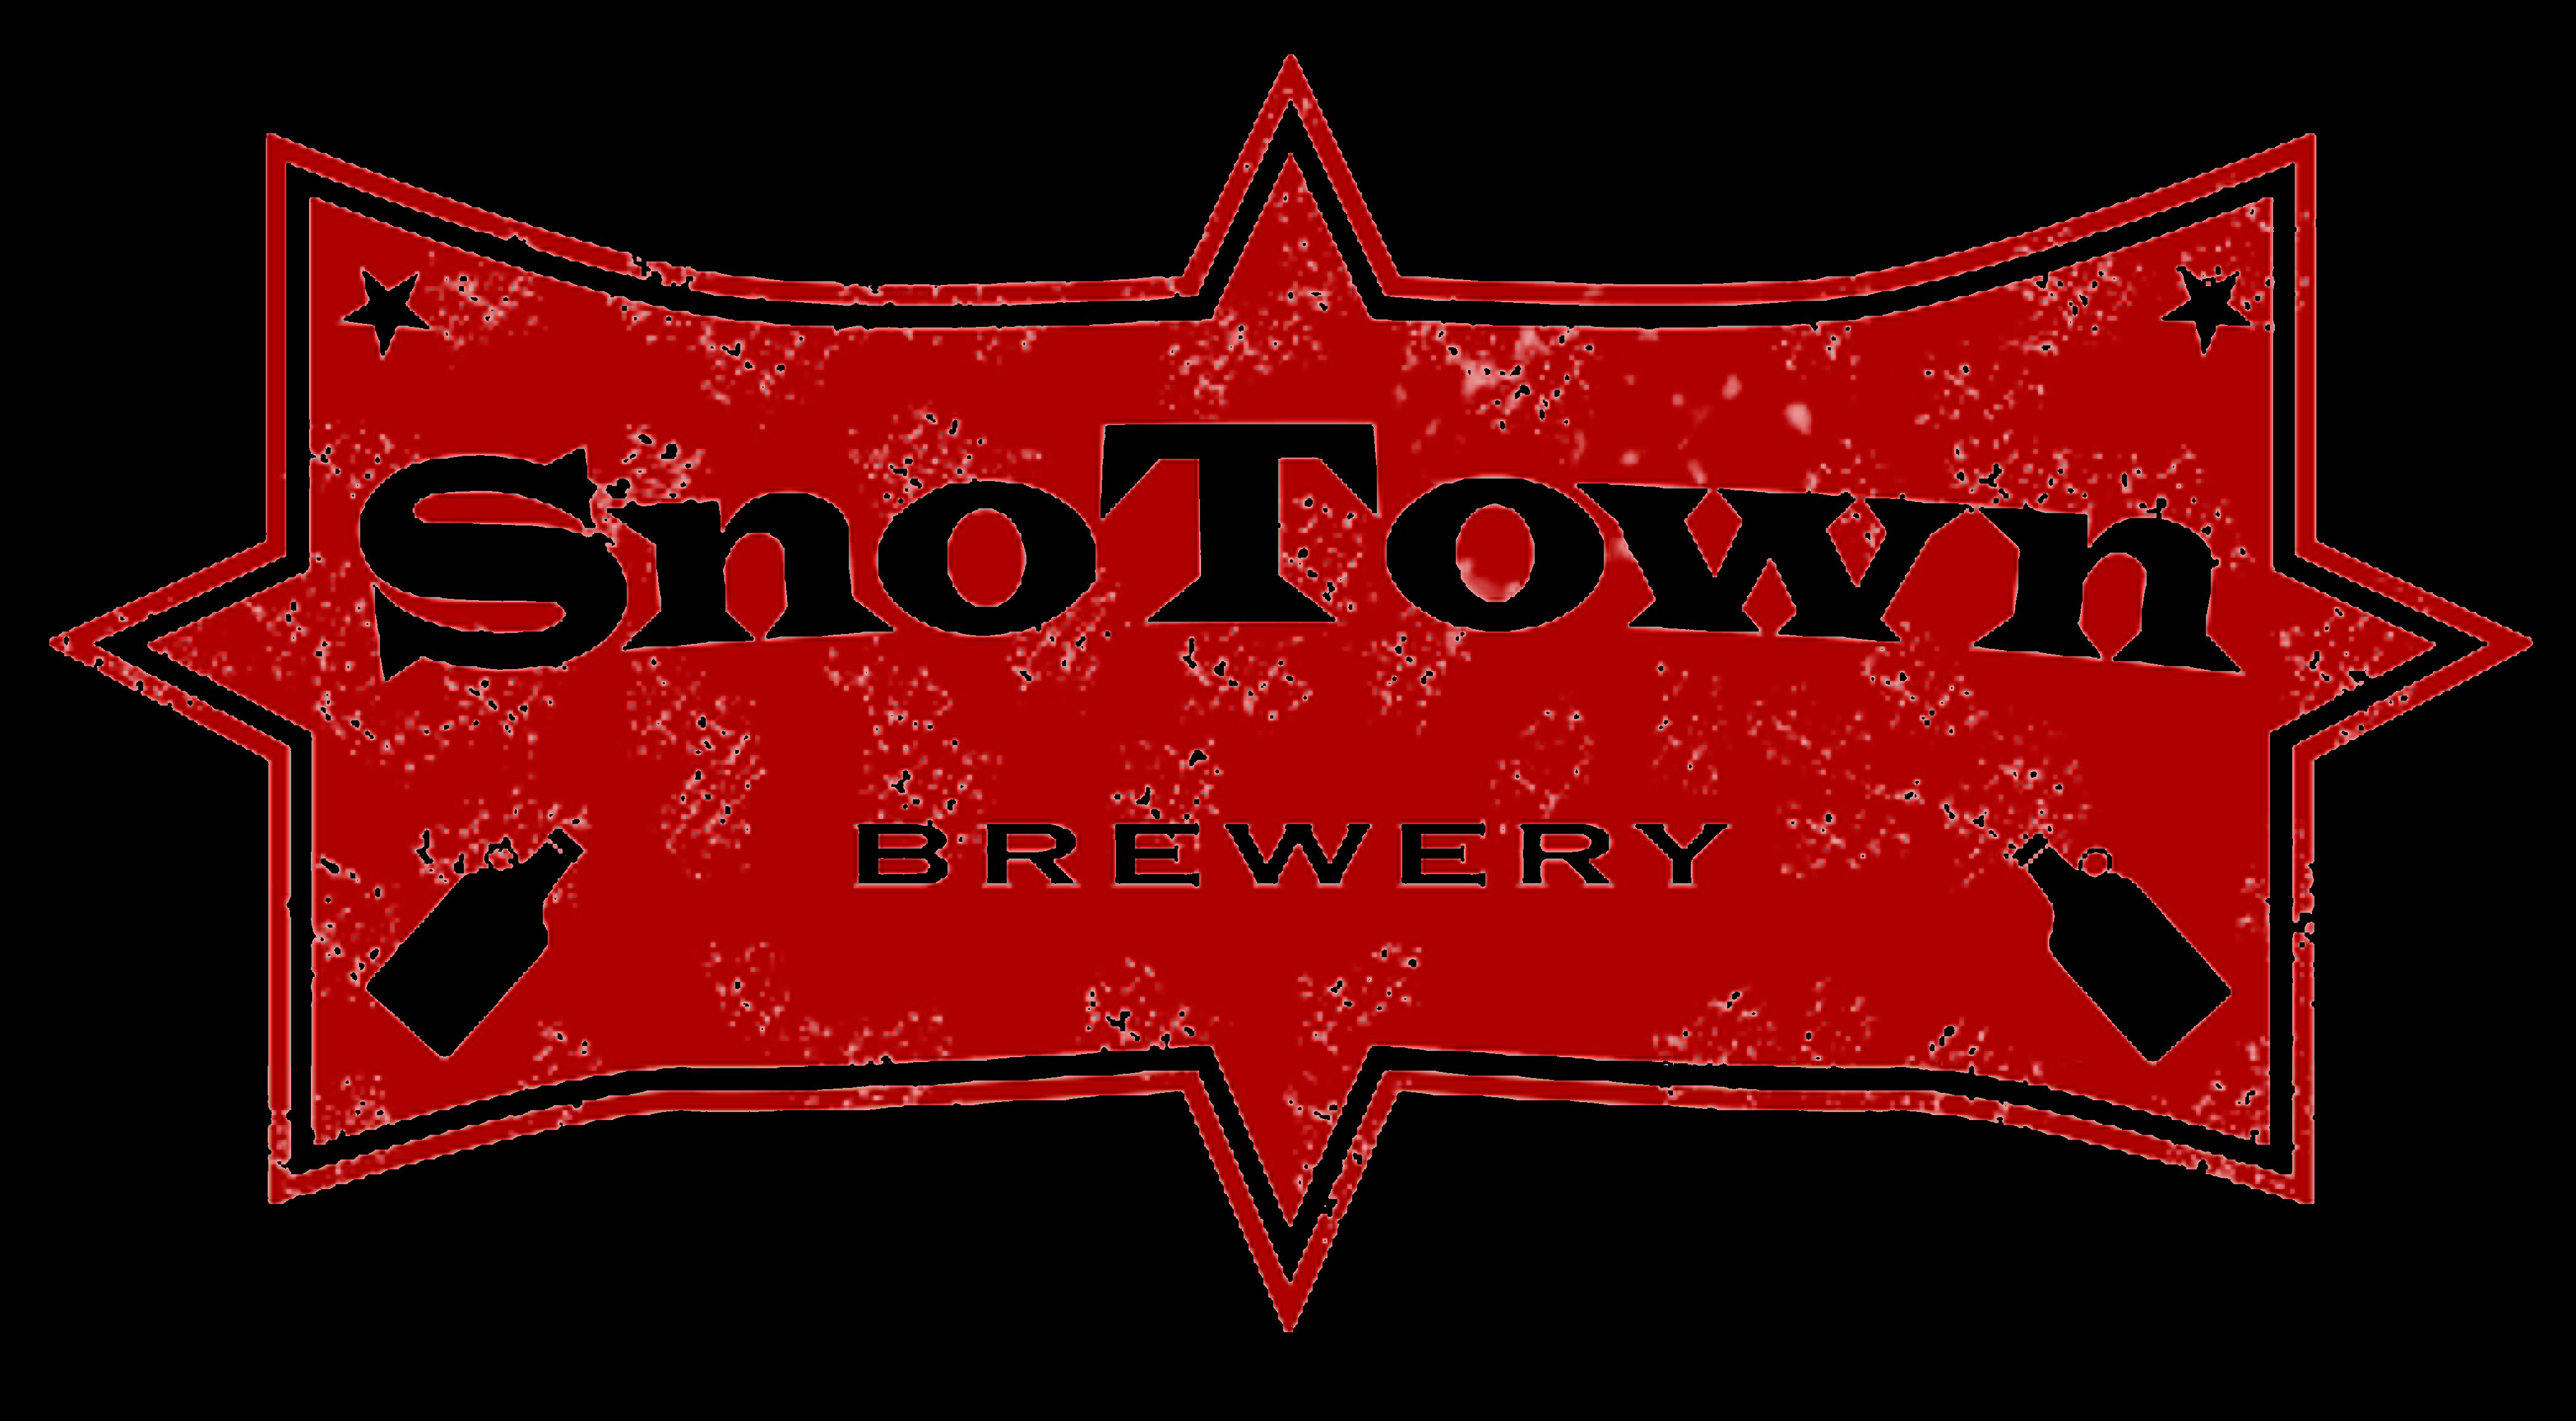 snotown-brewery